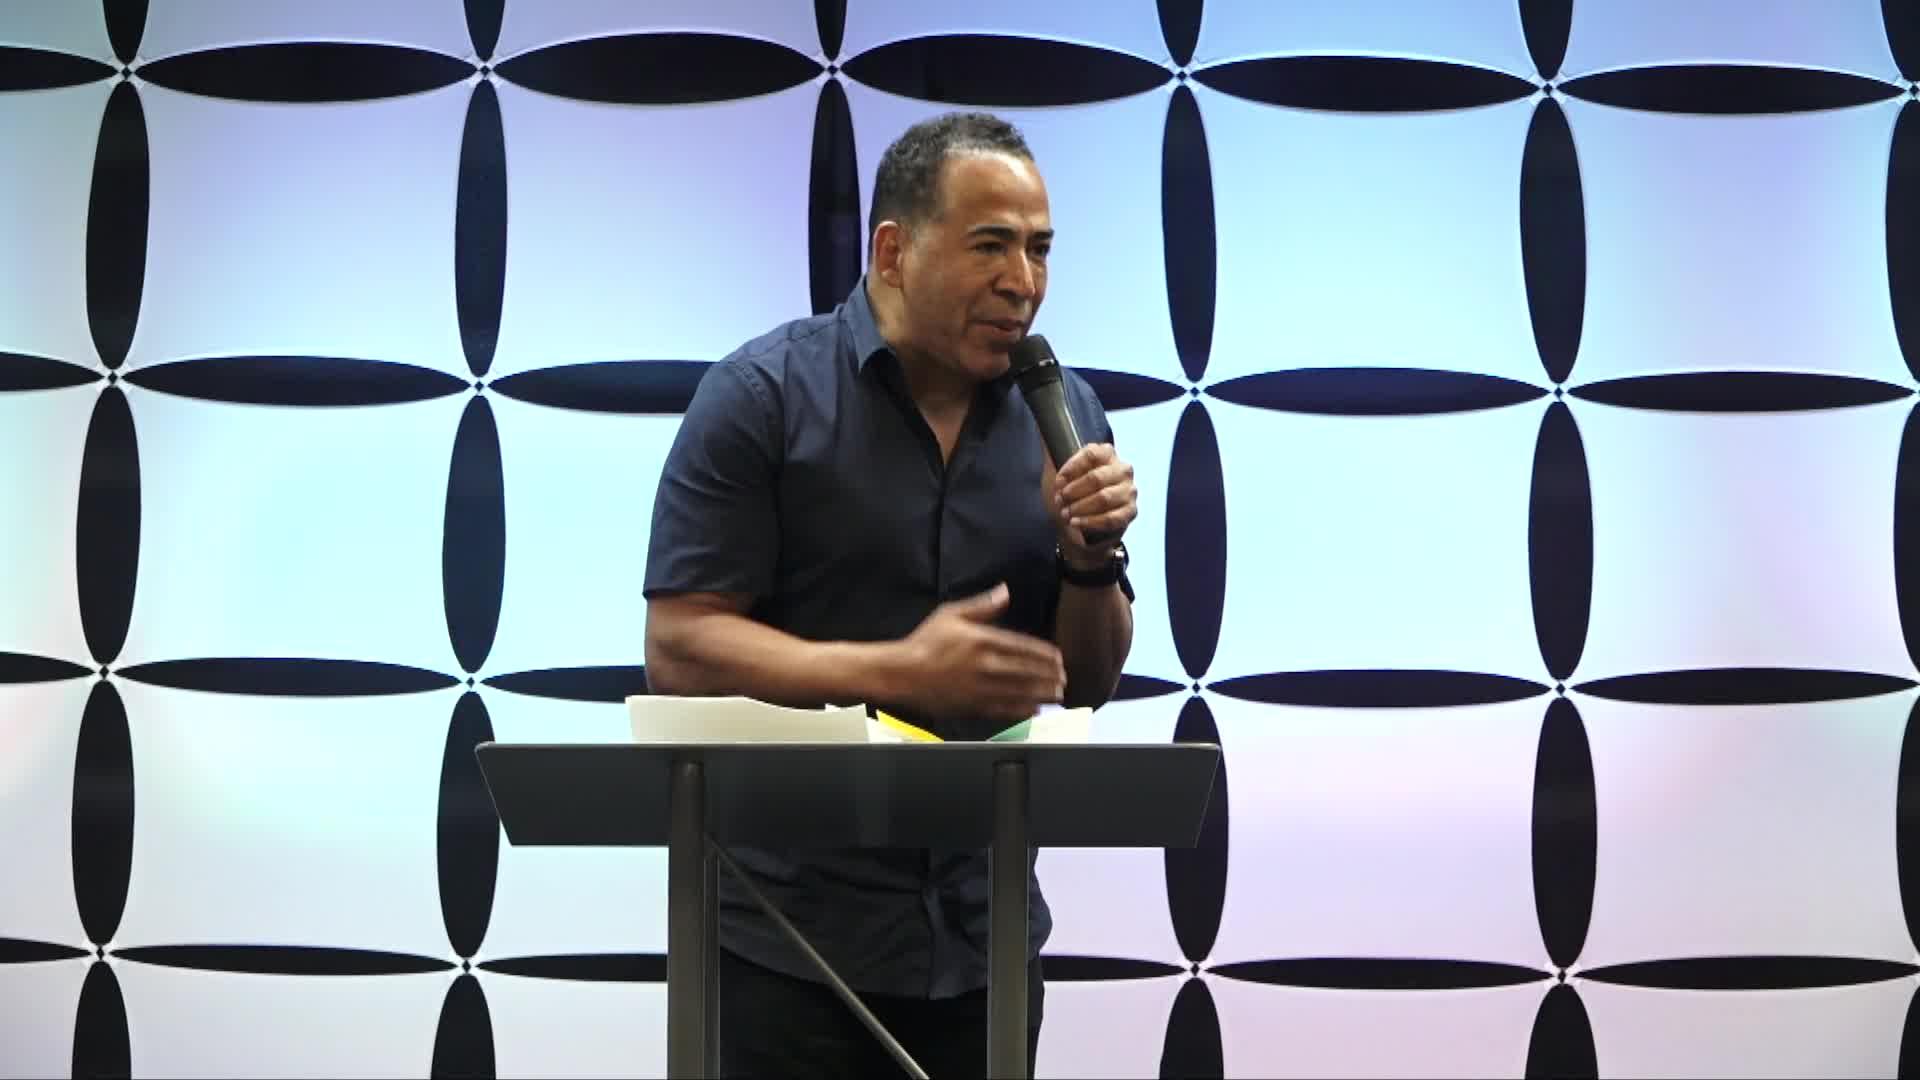 Tim Storey At The Body Of Christ Church International 08-17-2018-1